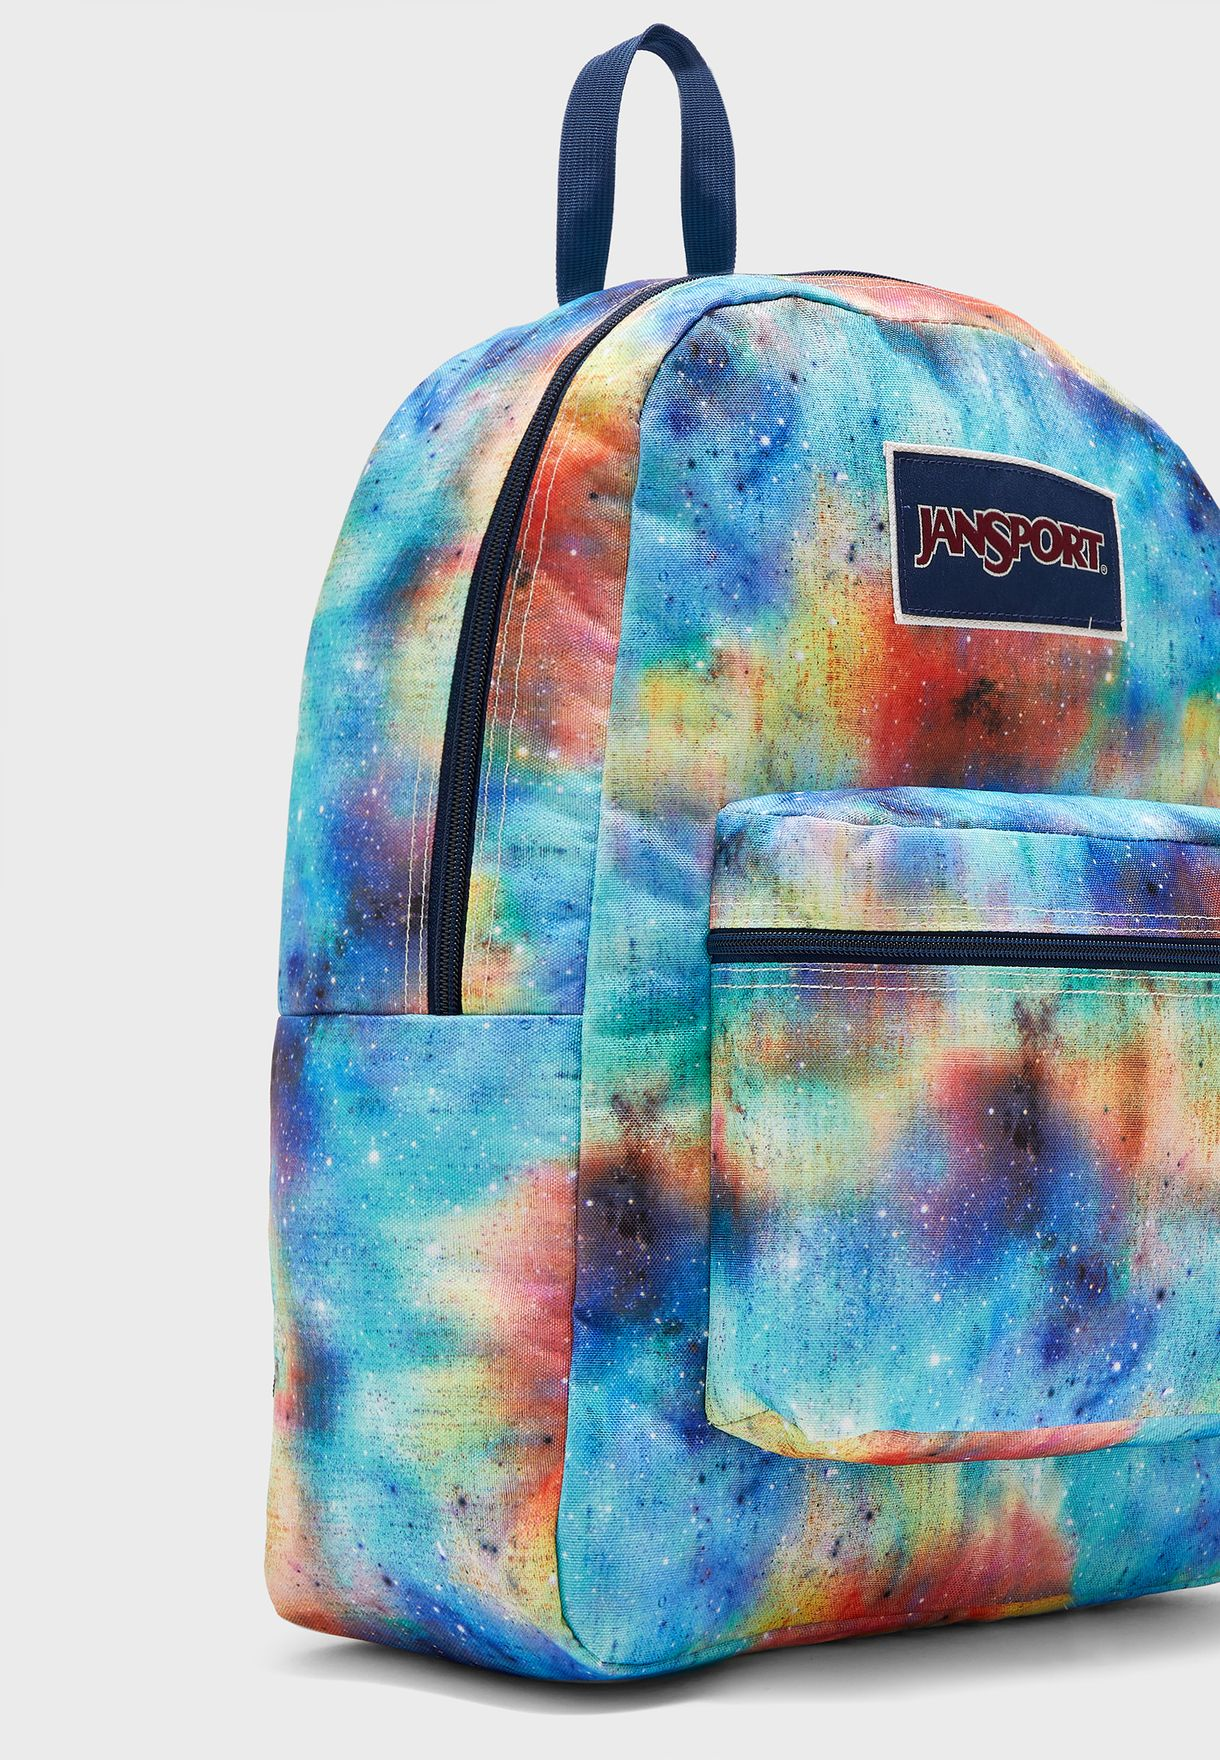 Multi Speckled Overexposed Backpack